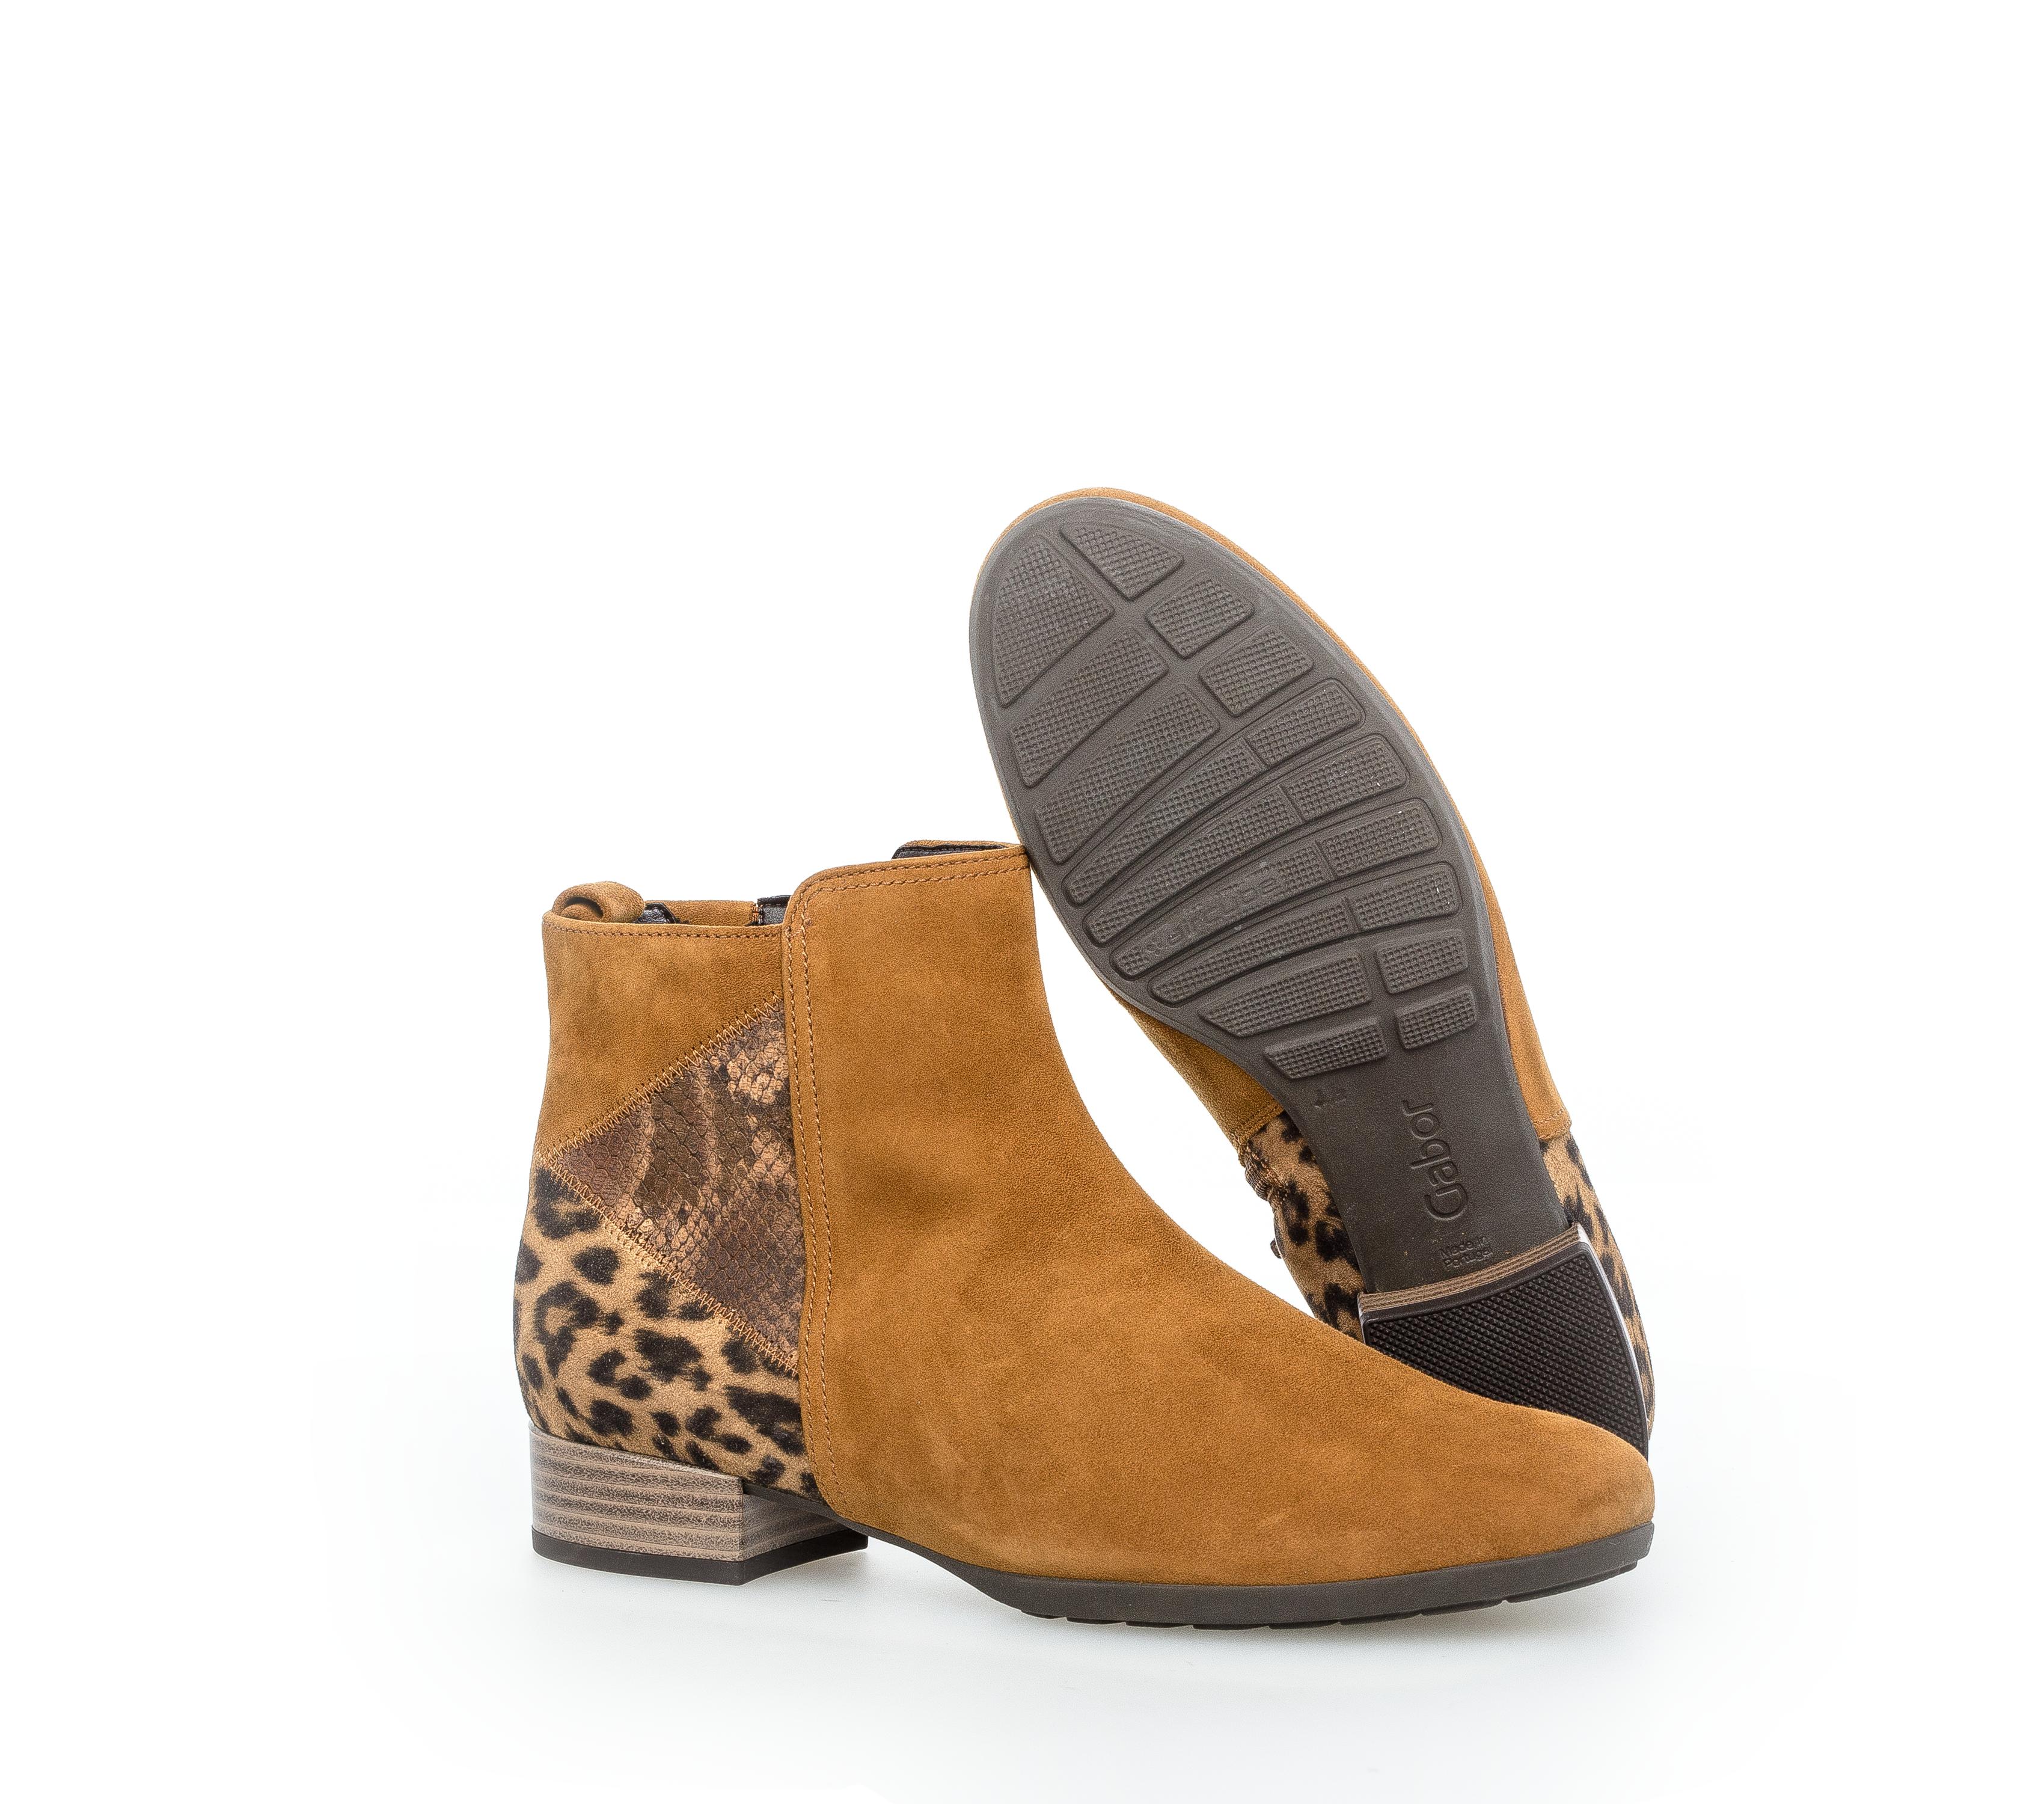 Gabor 52.716.42 Boots, Cognac, 38.5